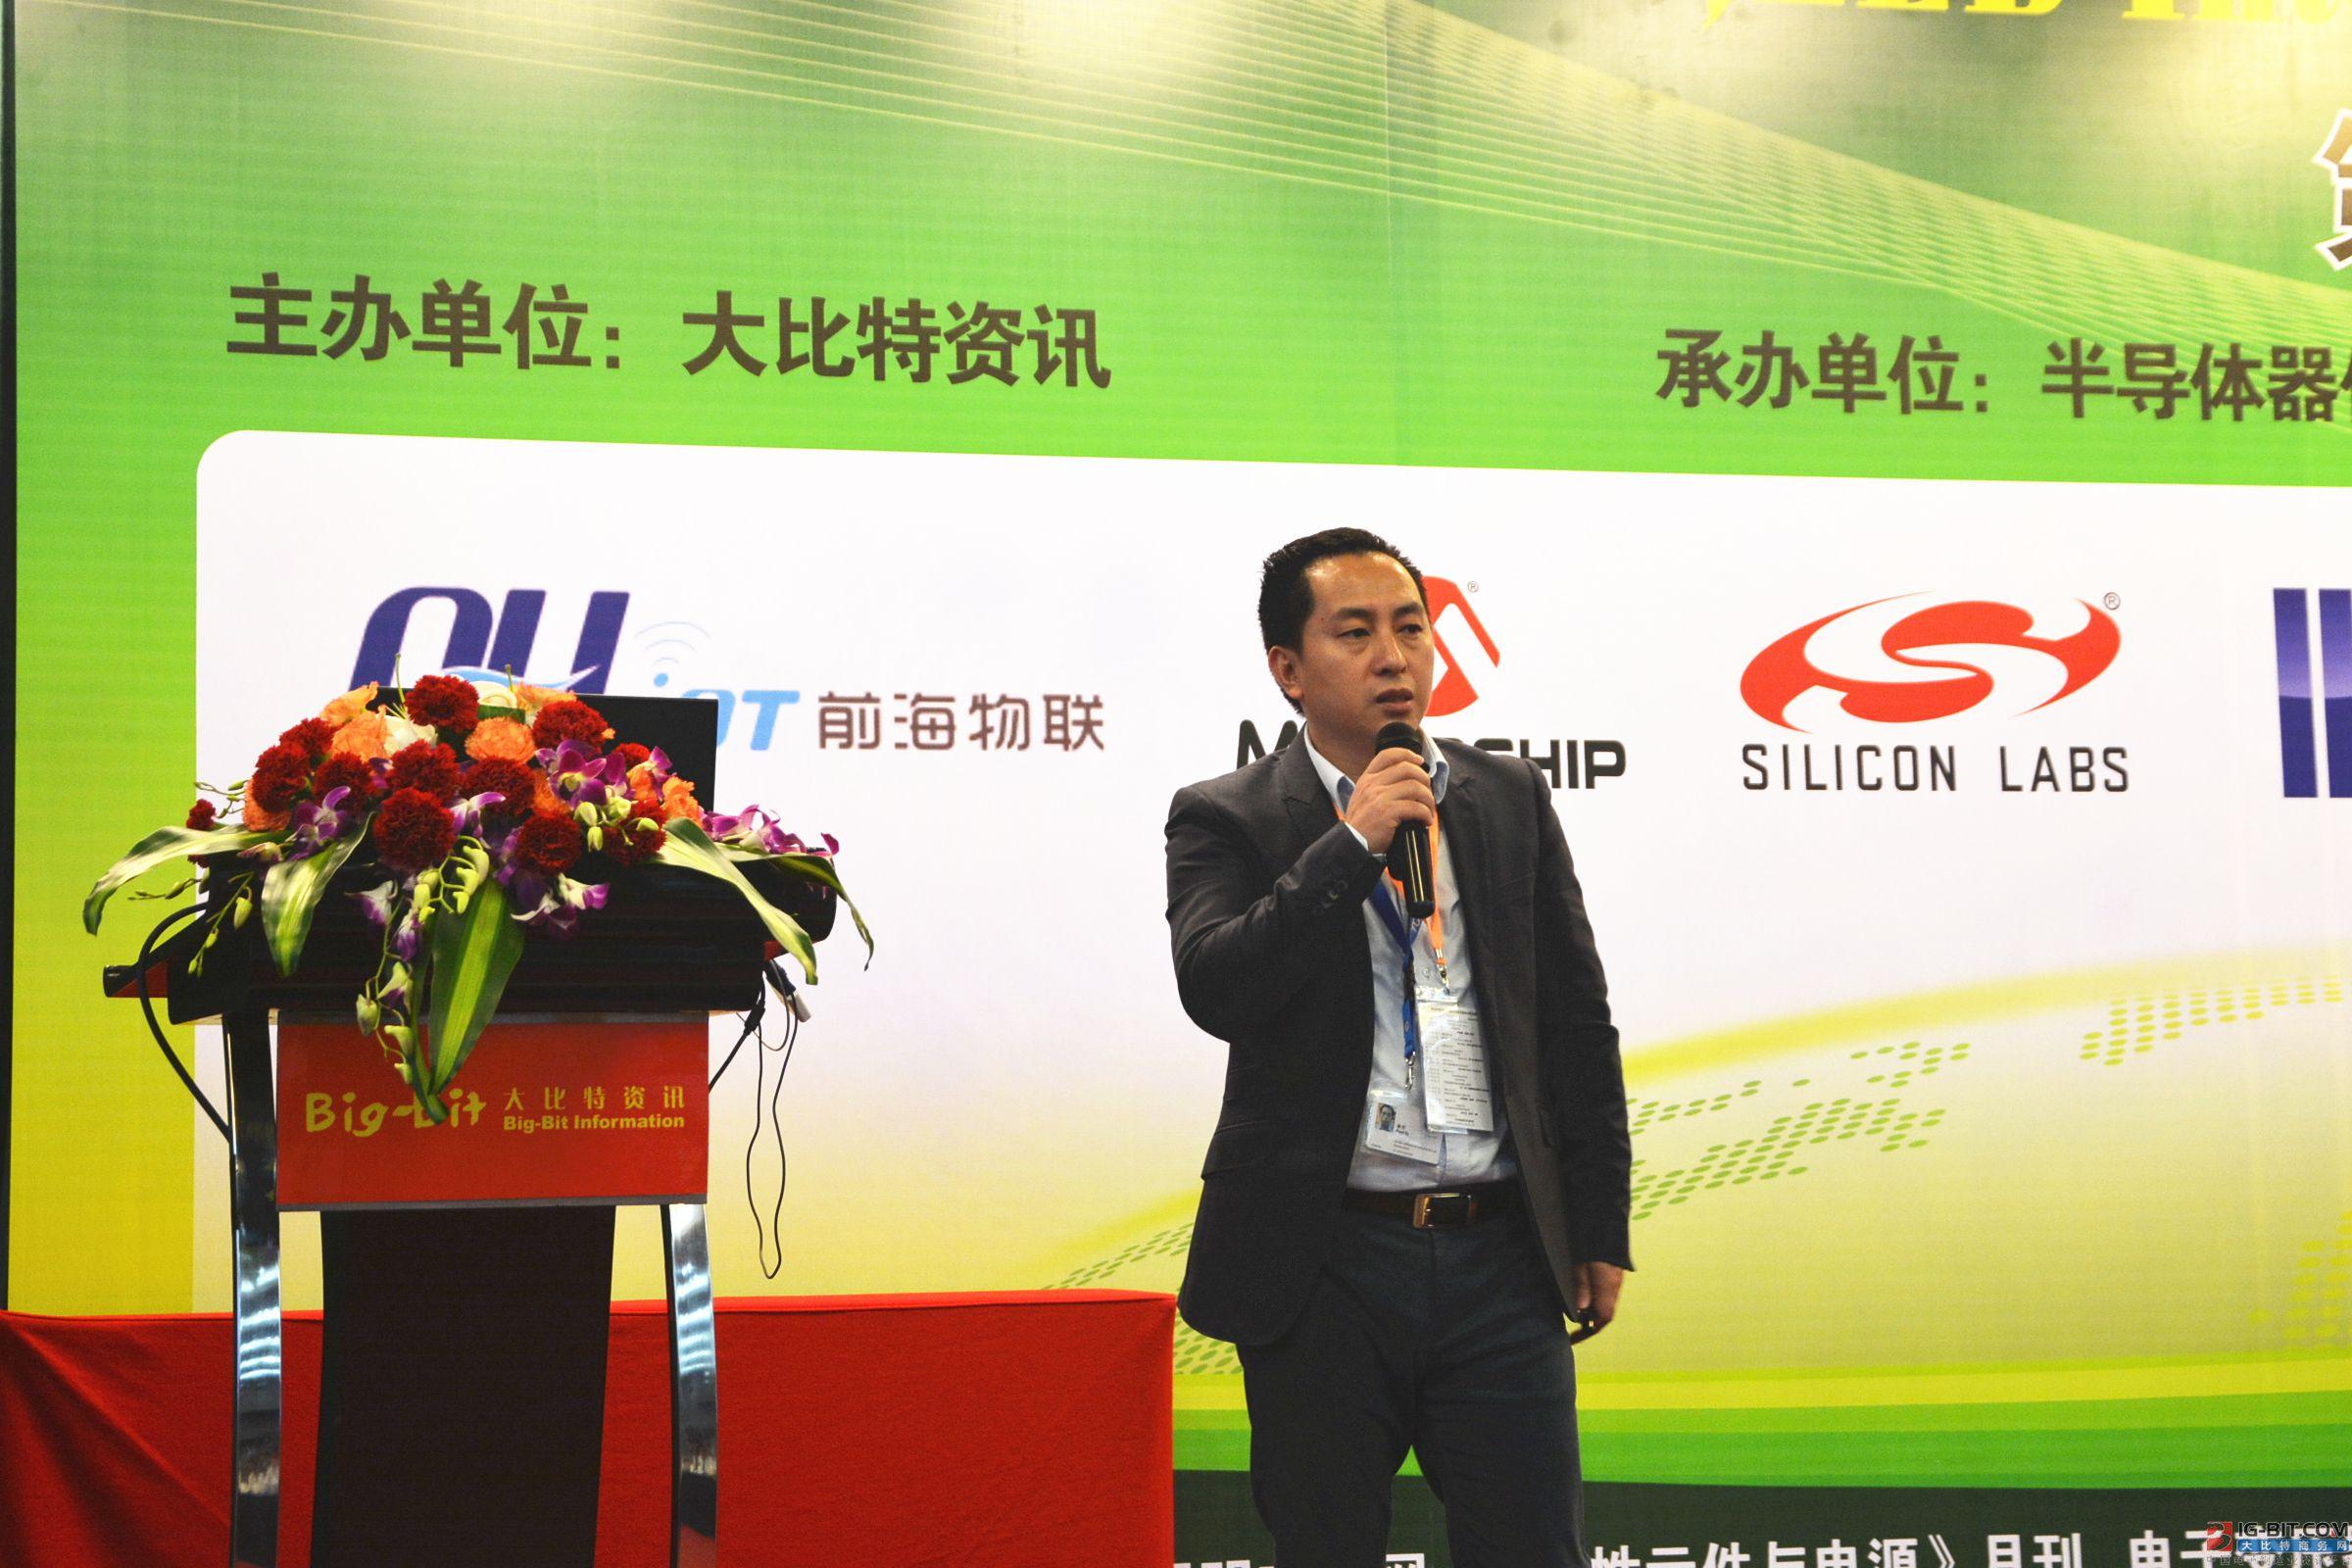 TUV电磁兼容测试服务部华南区经理余川